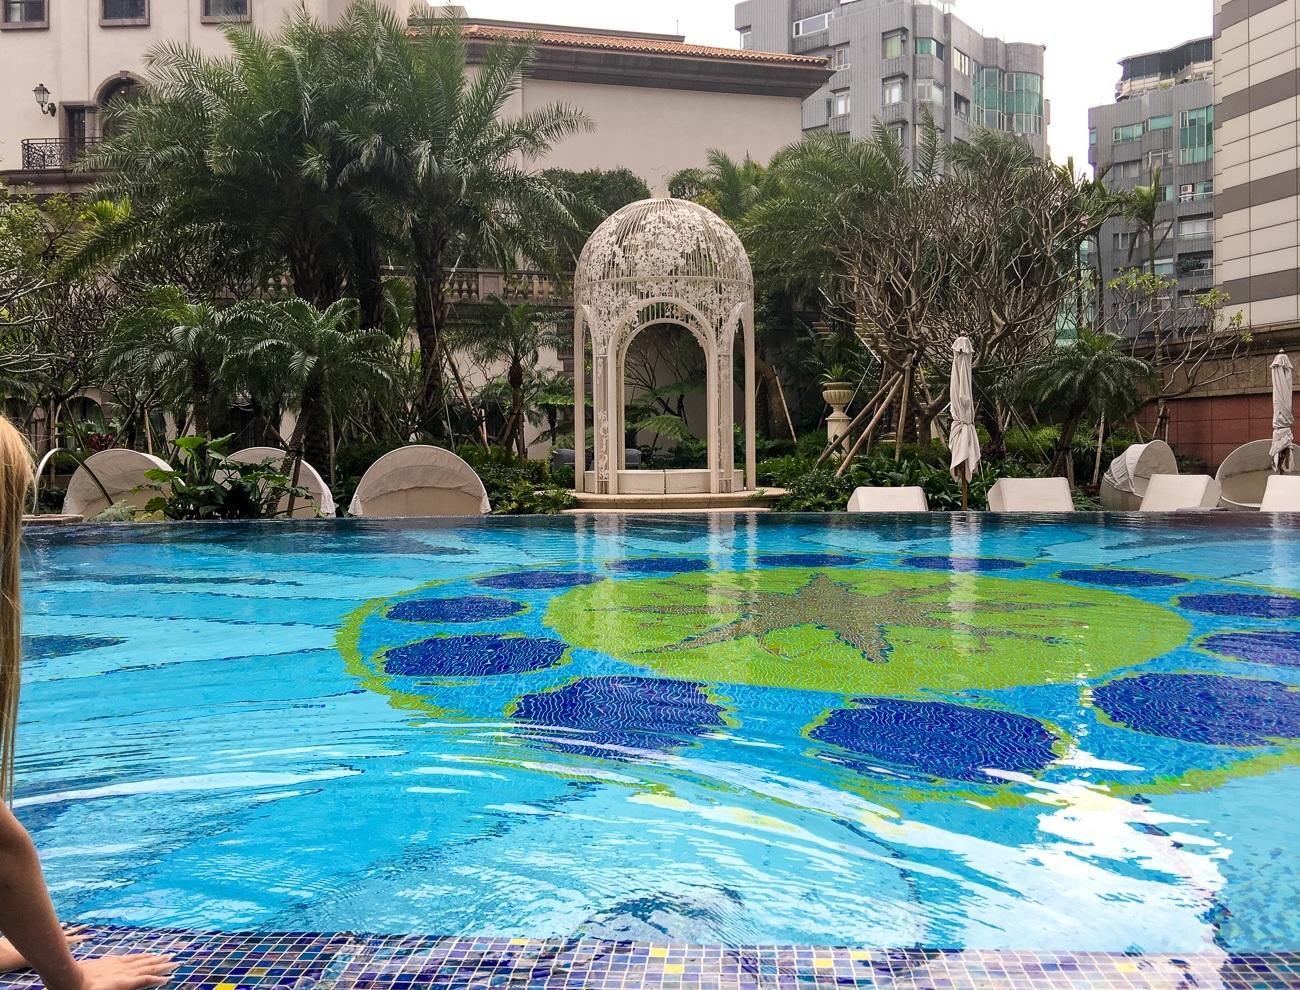 The pool at Mandarin Oriental, Taipei